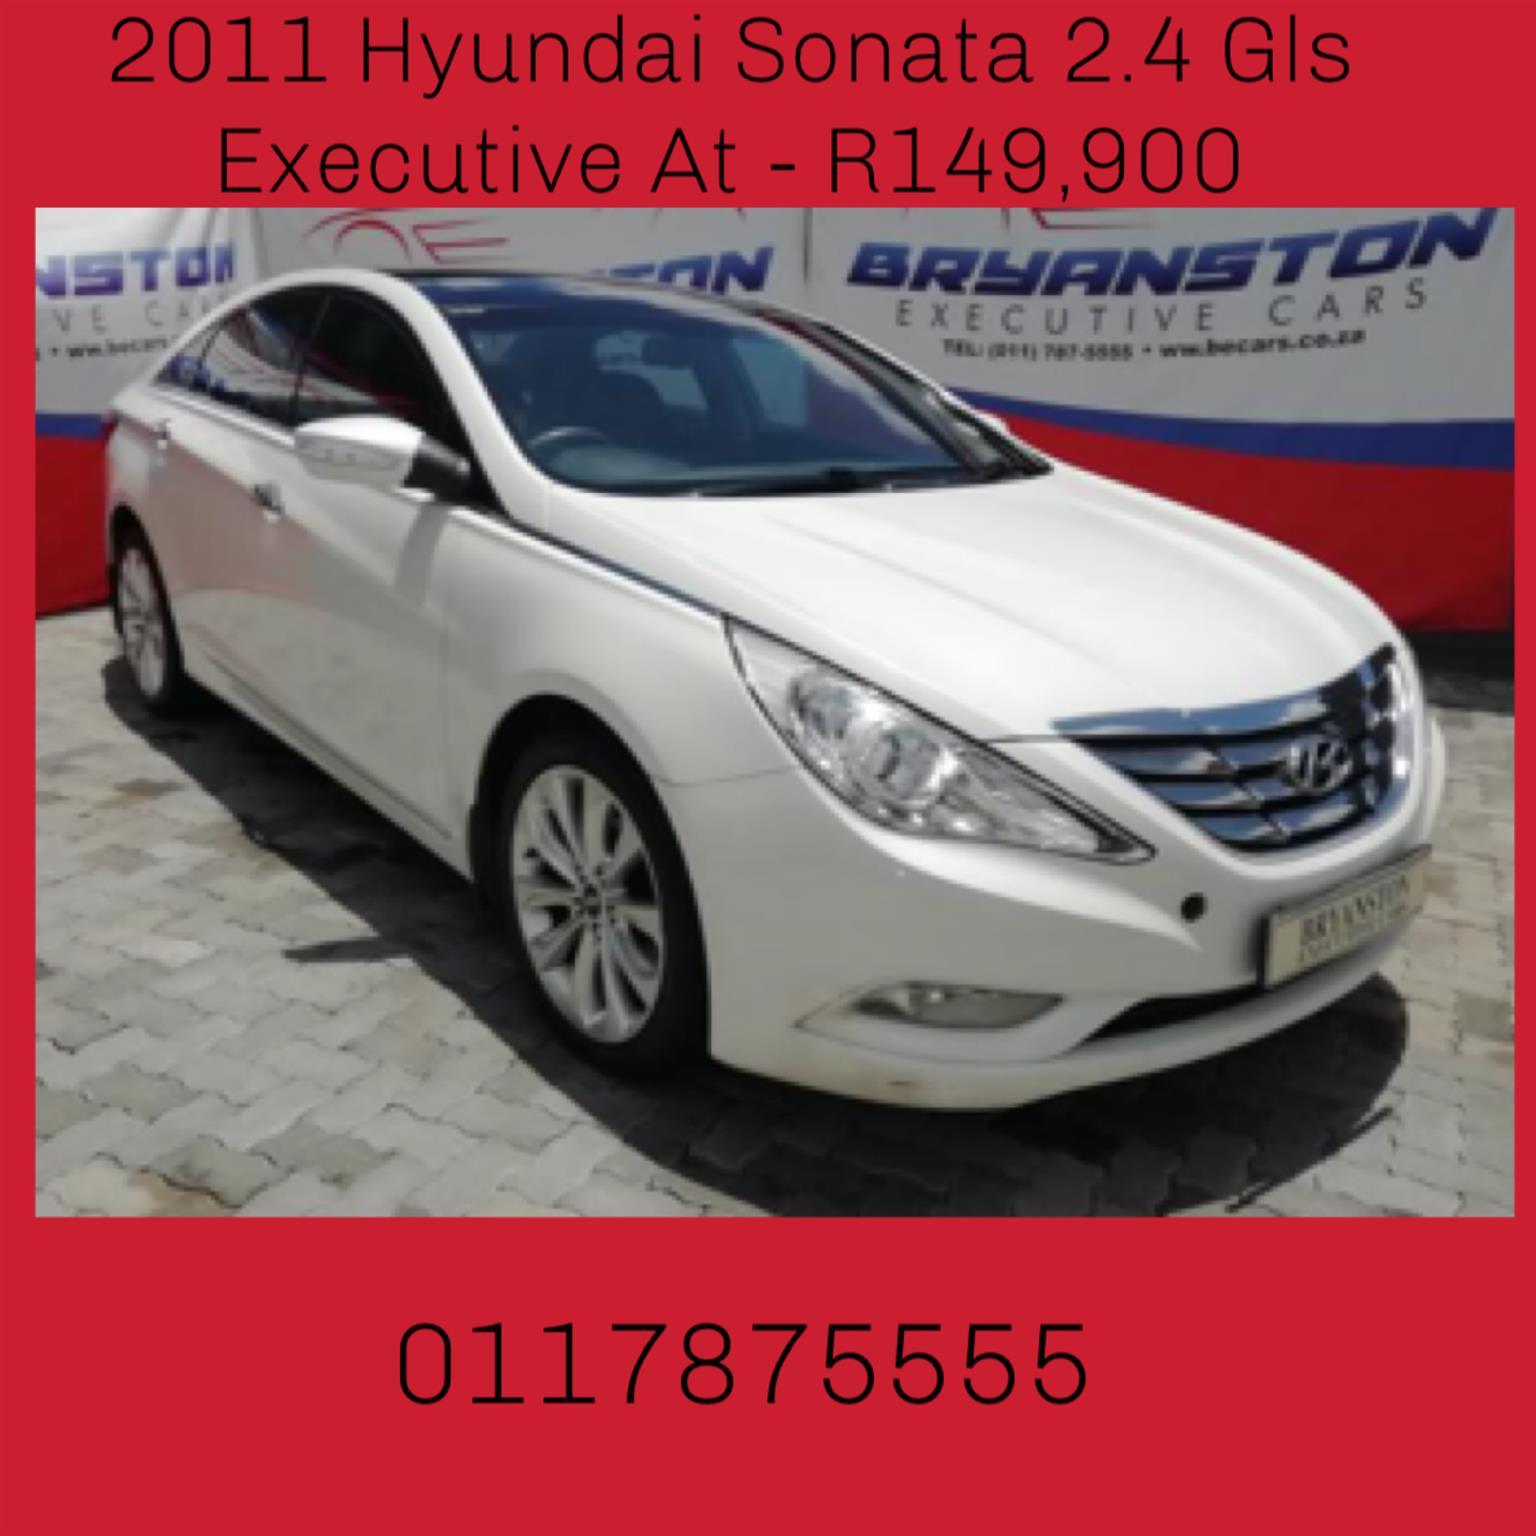 2011 Hyundai Sonata 2.4 GLS automatic